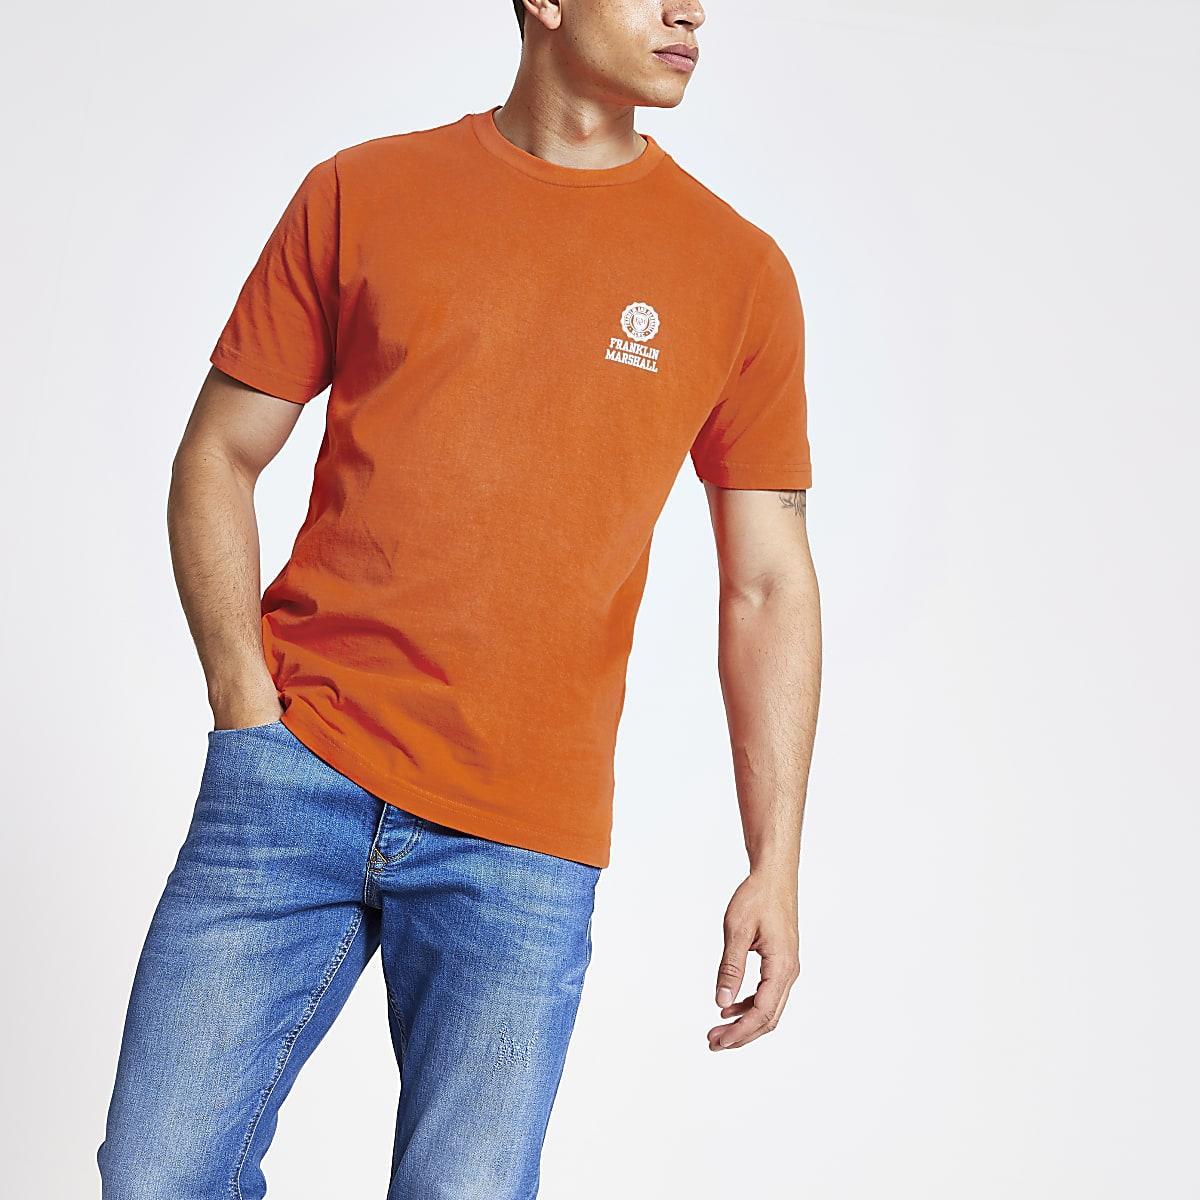 Franklin and Marshall - Oranje T-shirt met logo